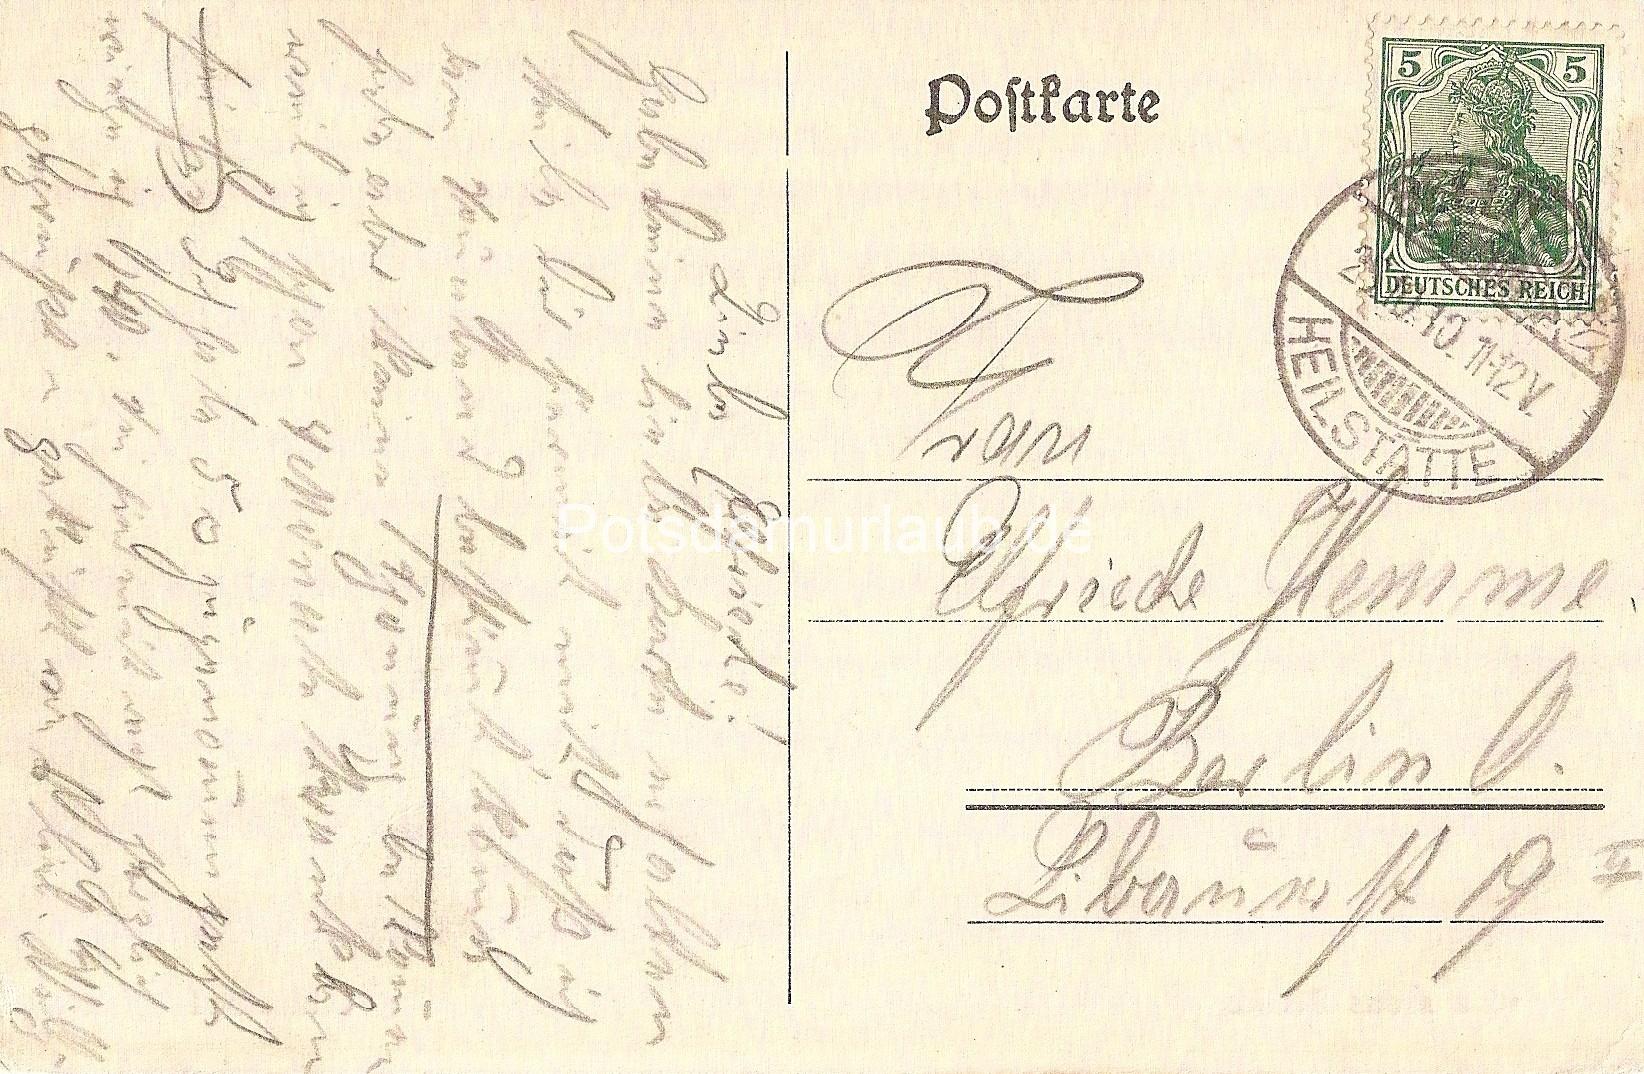 1910 10 25